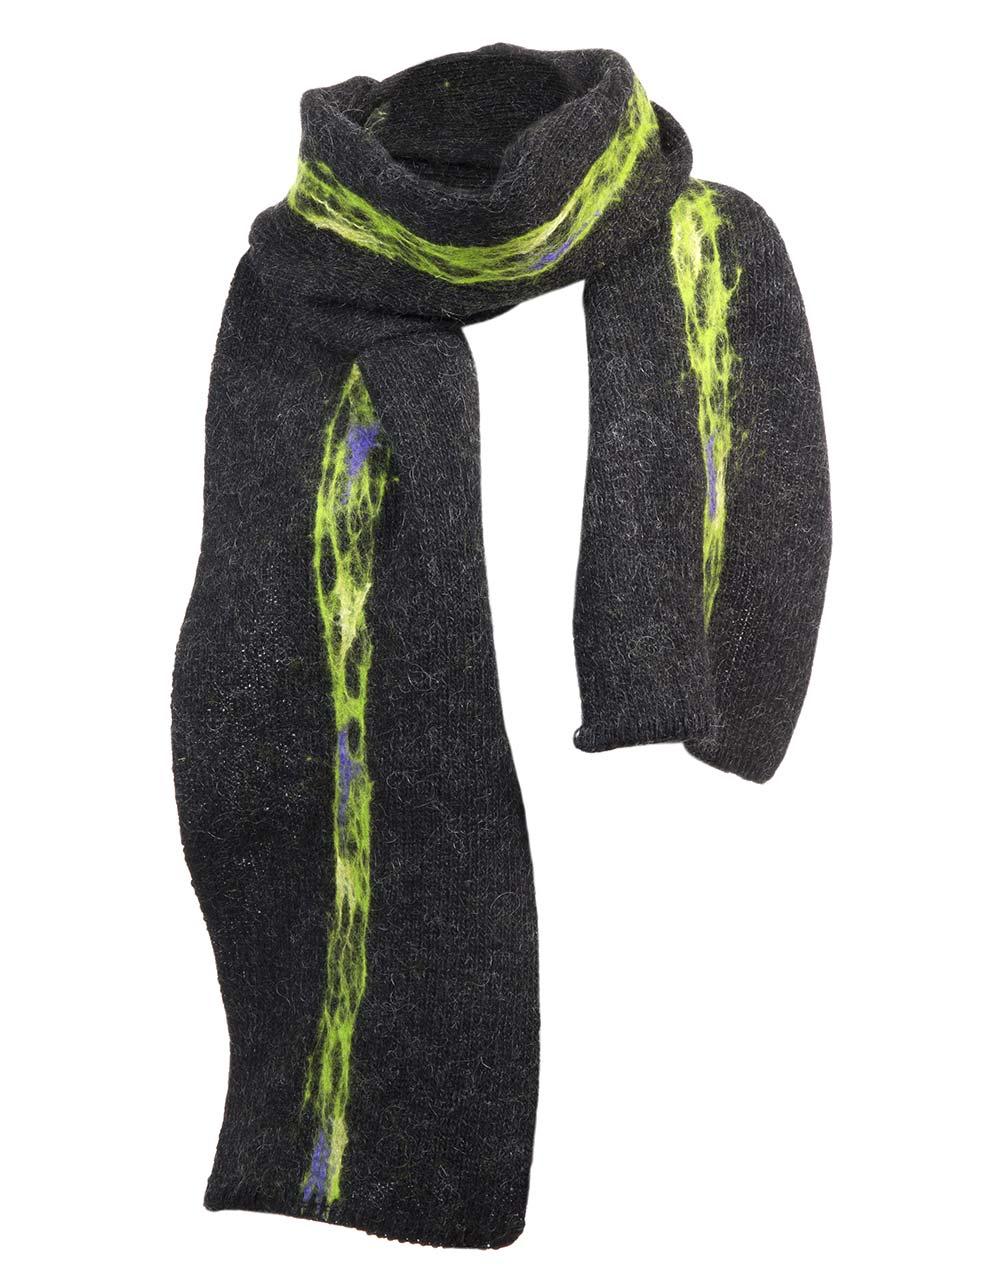 aurora scarf, gjoska.is